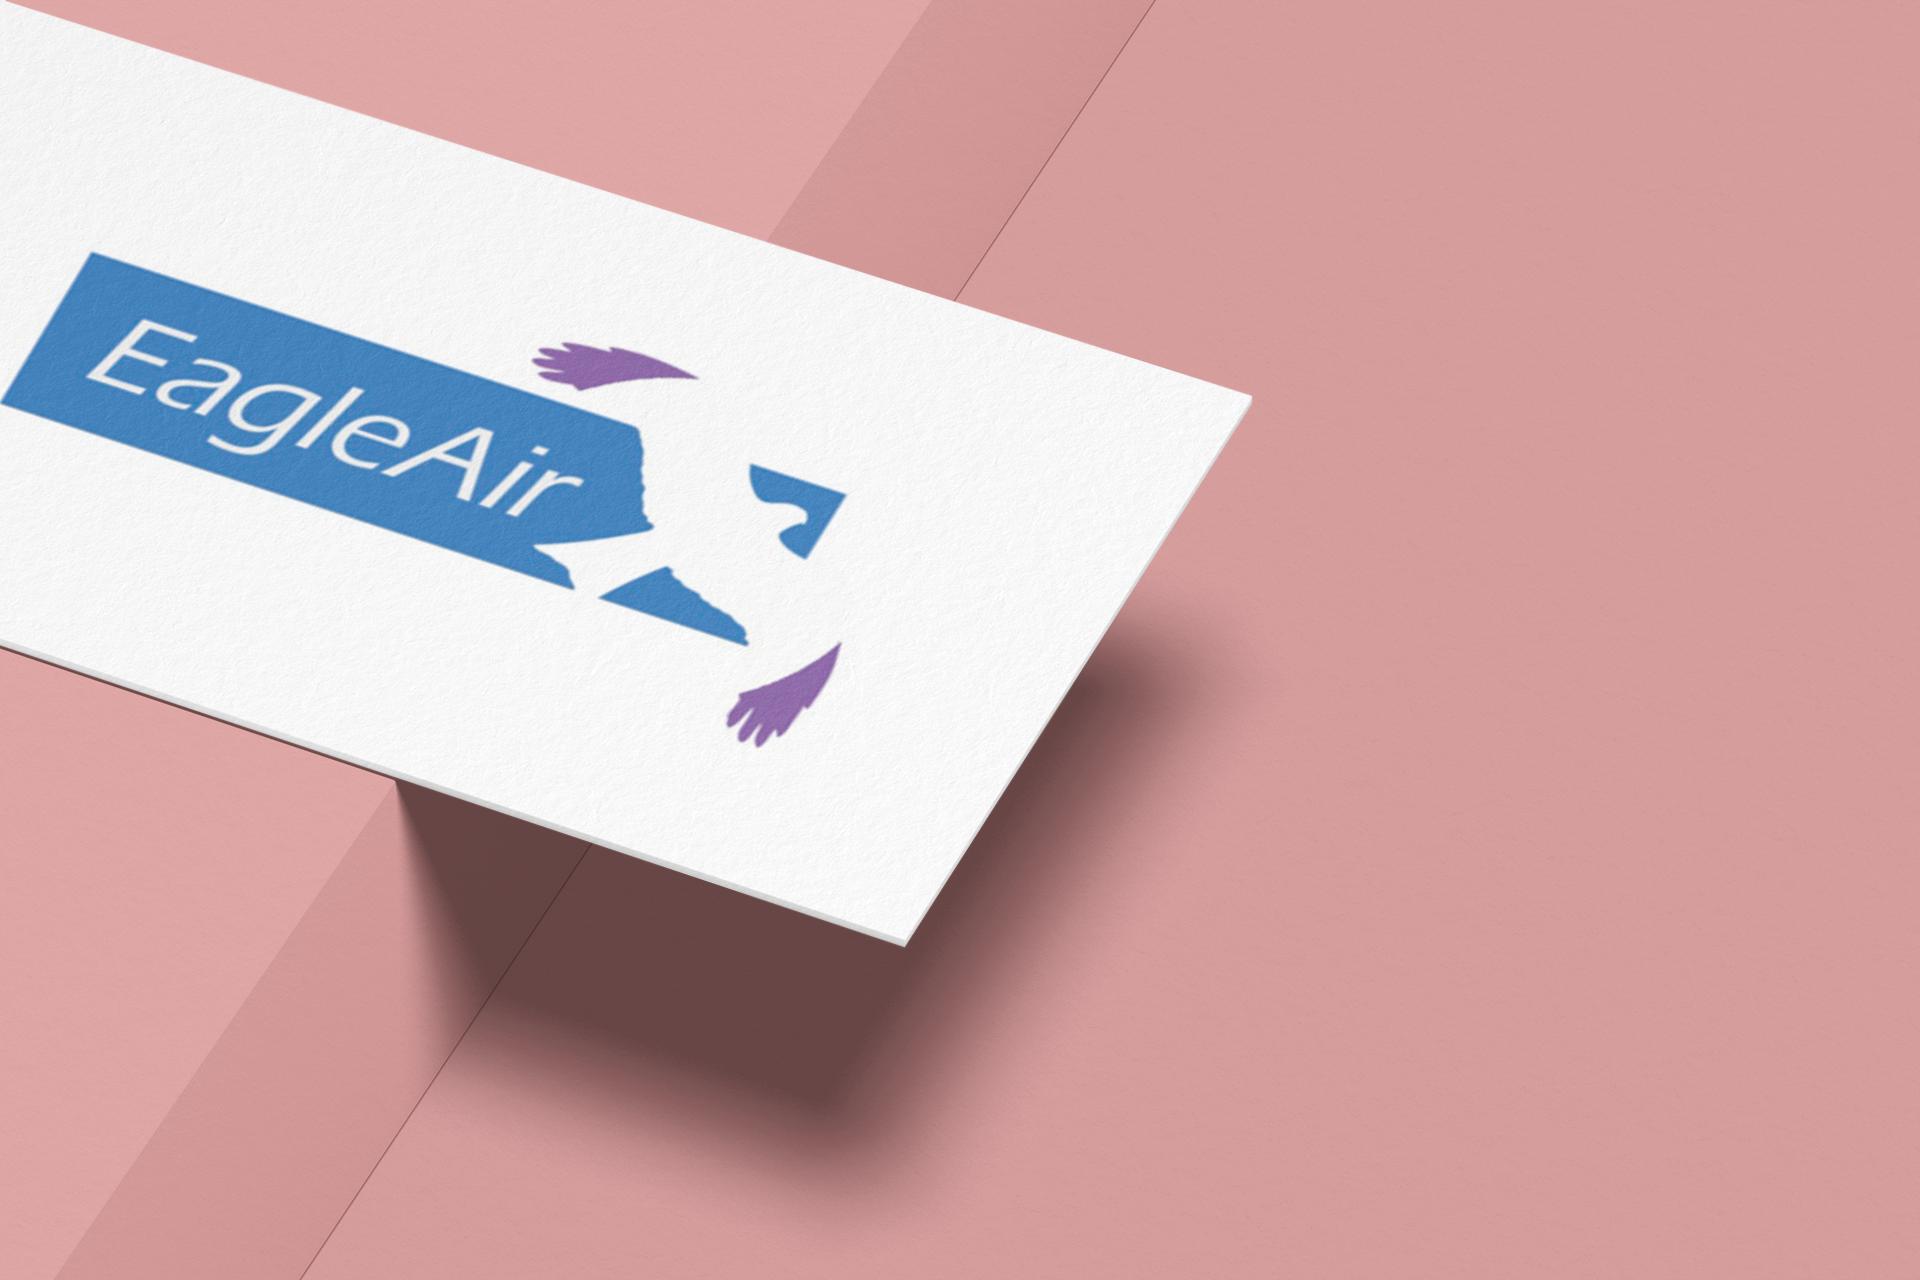 eagleair logo mockup on card